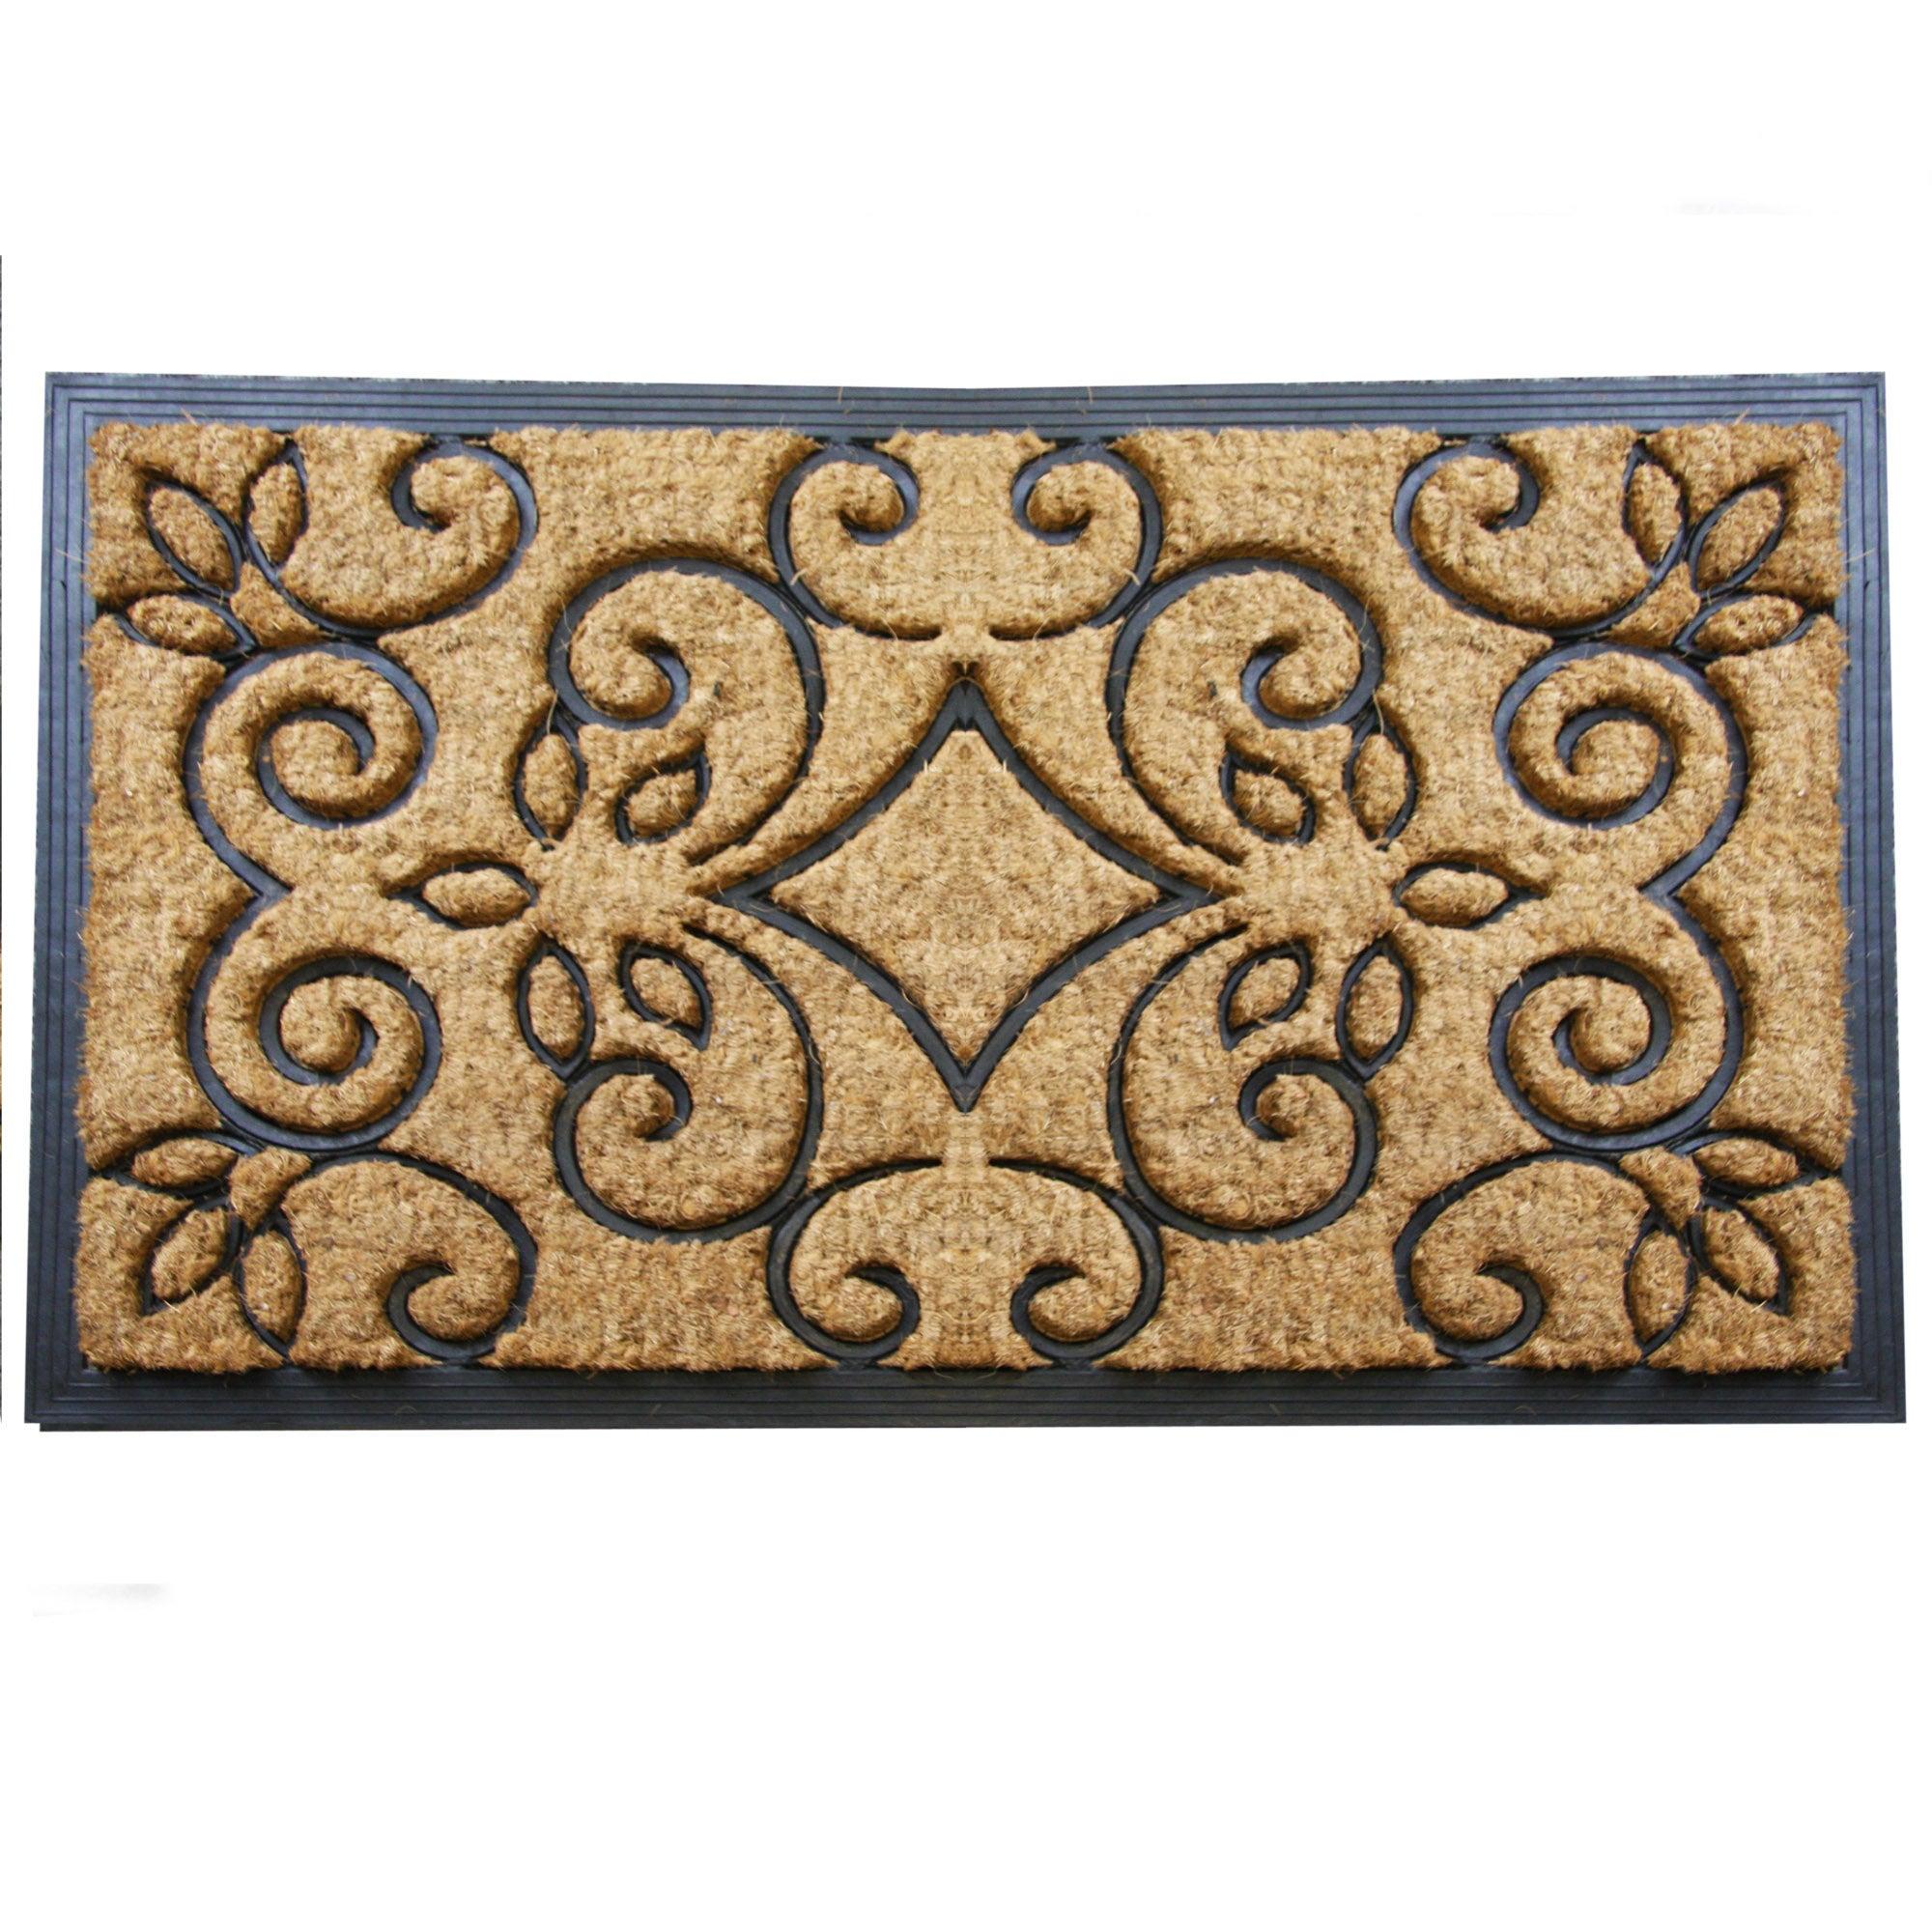 Jumbo Scroll Rubber and Coir Doormat Brown